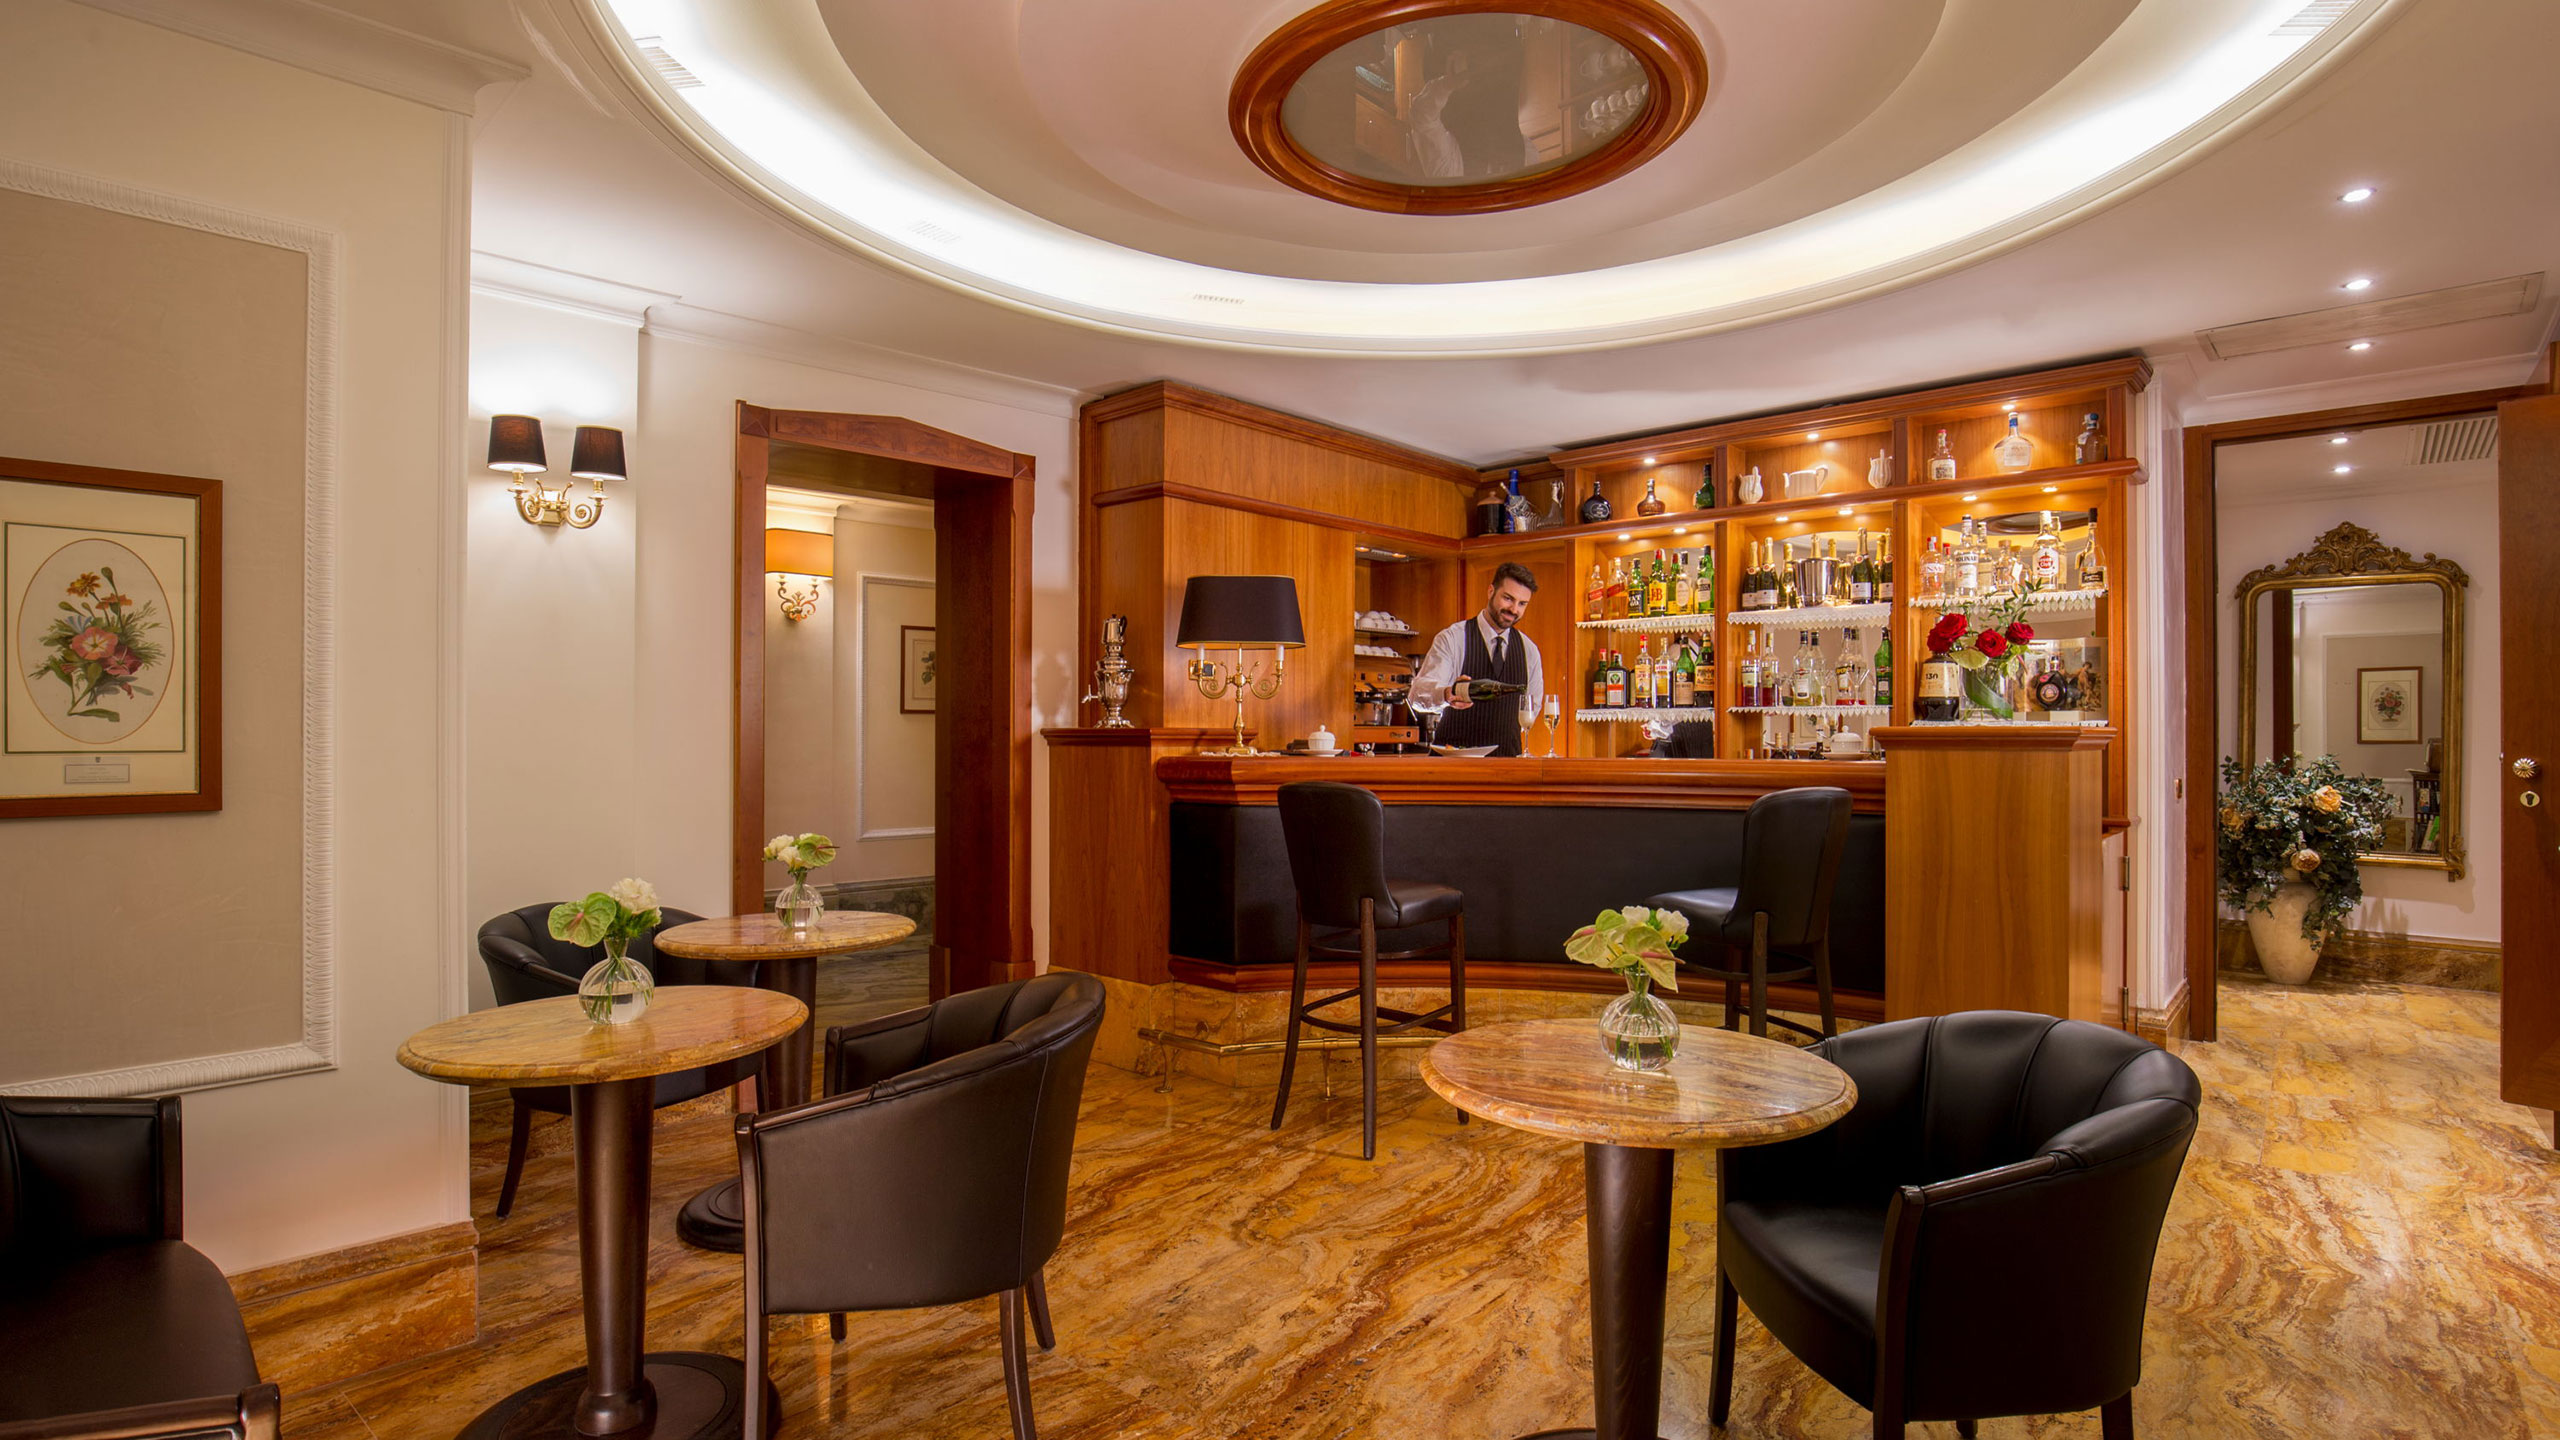 albergo-ottocento-roma-bar-01